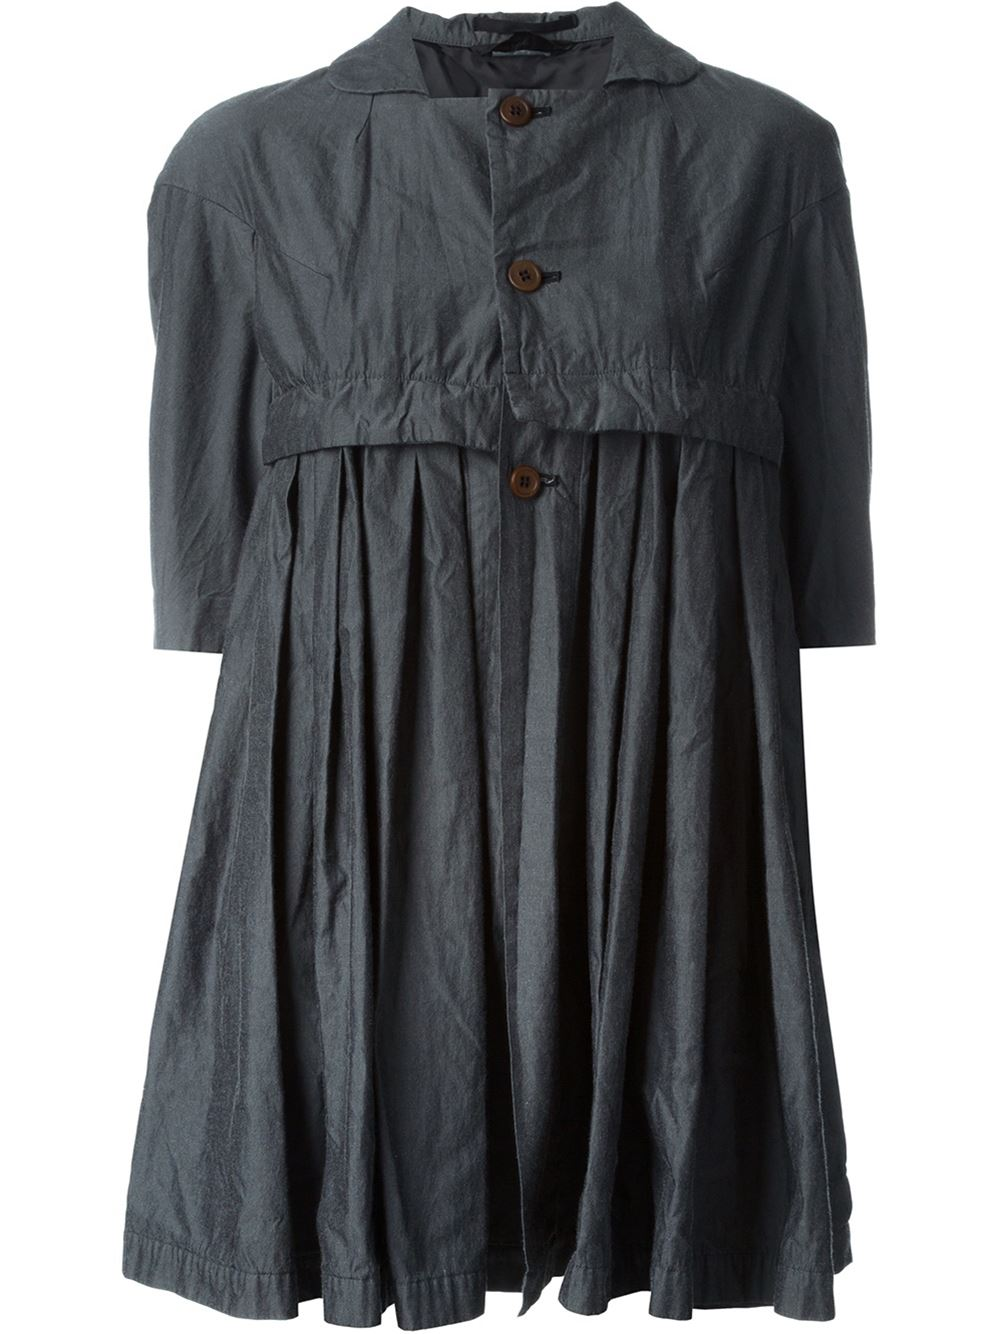 Short sleeved jacket, £840, by Comme Des Garçons. www.farfetch.com